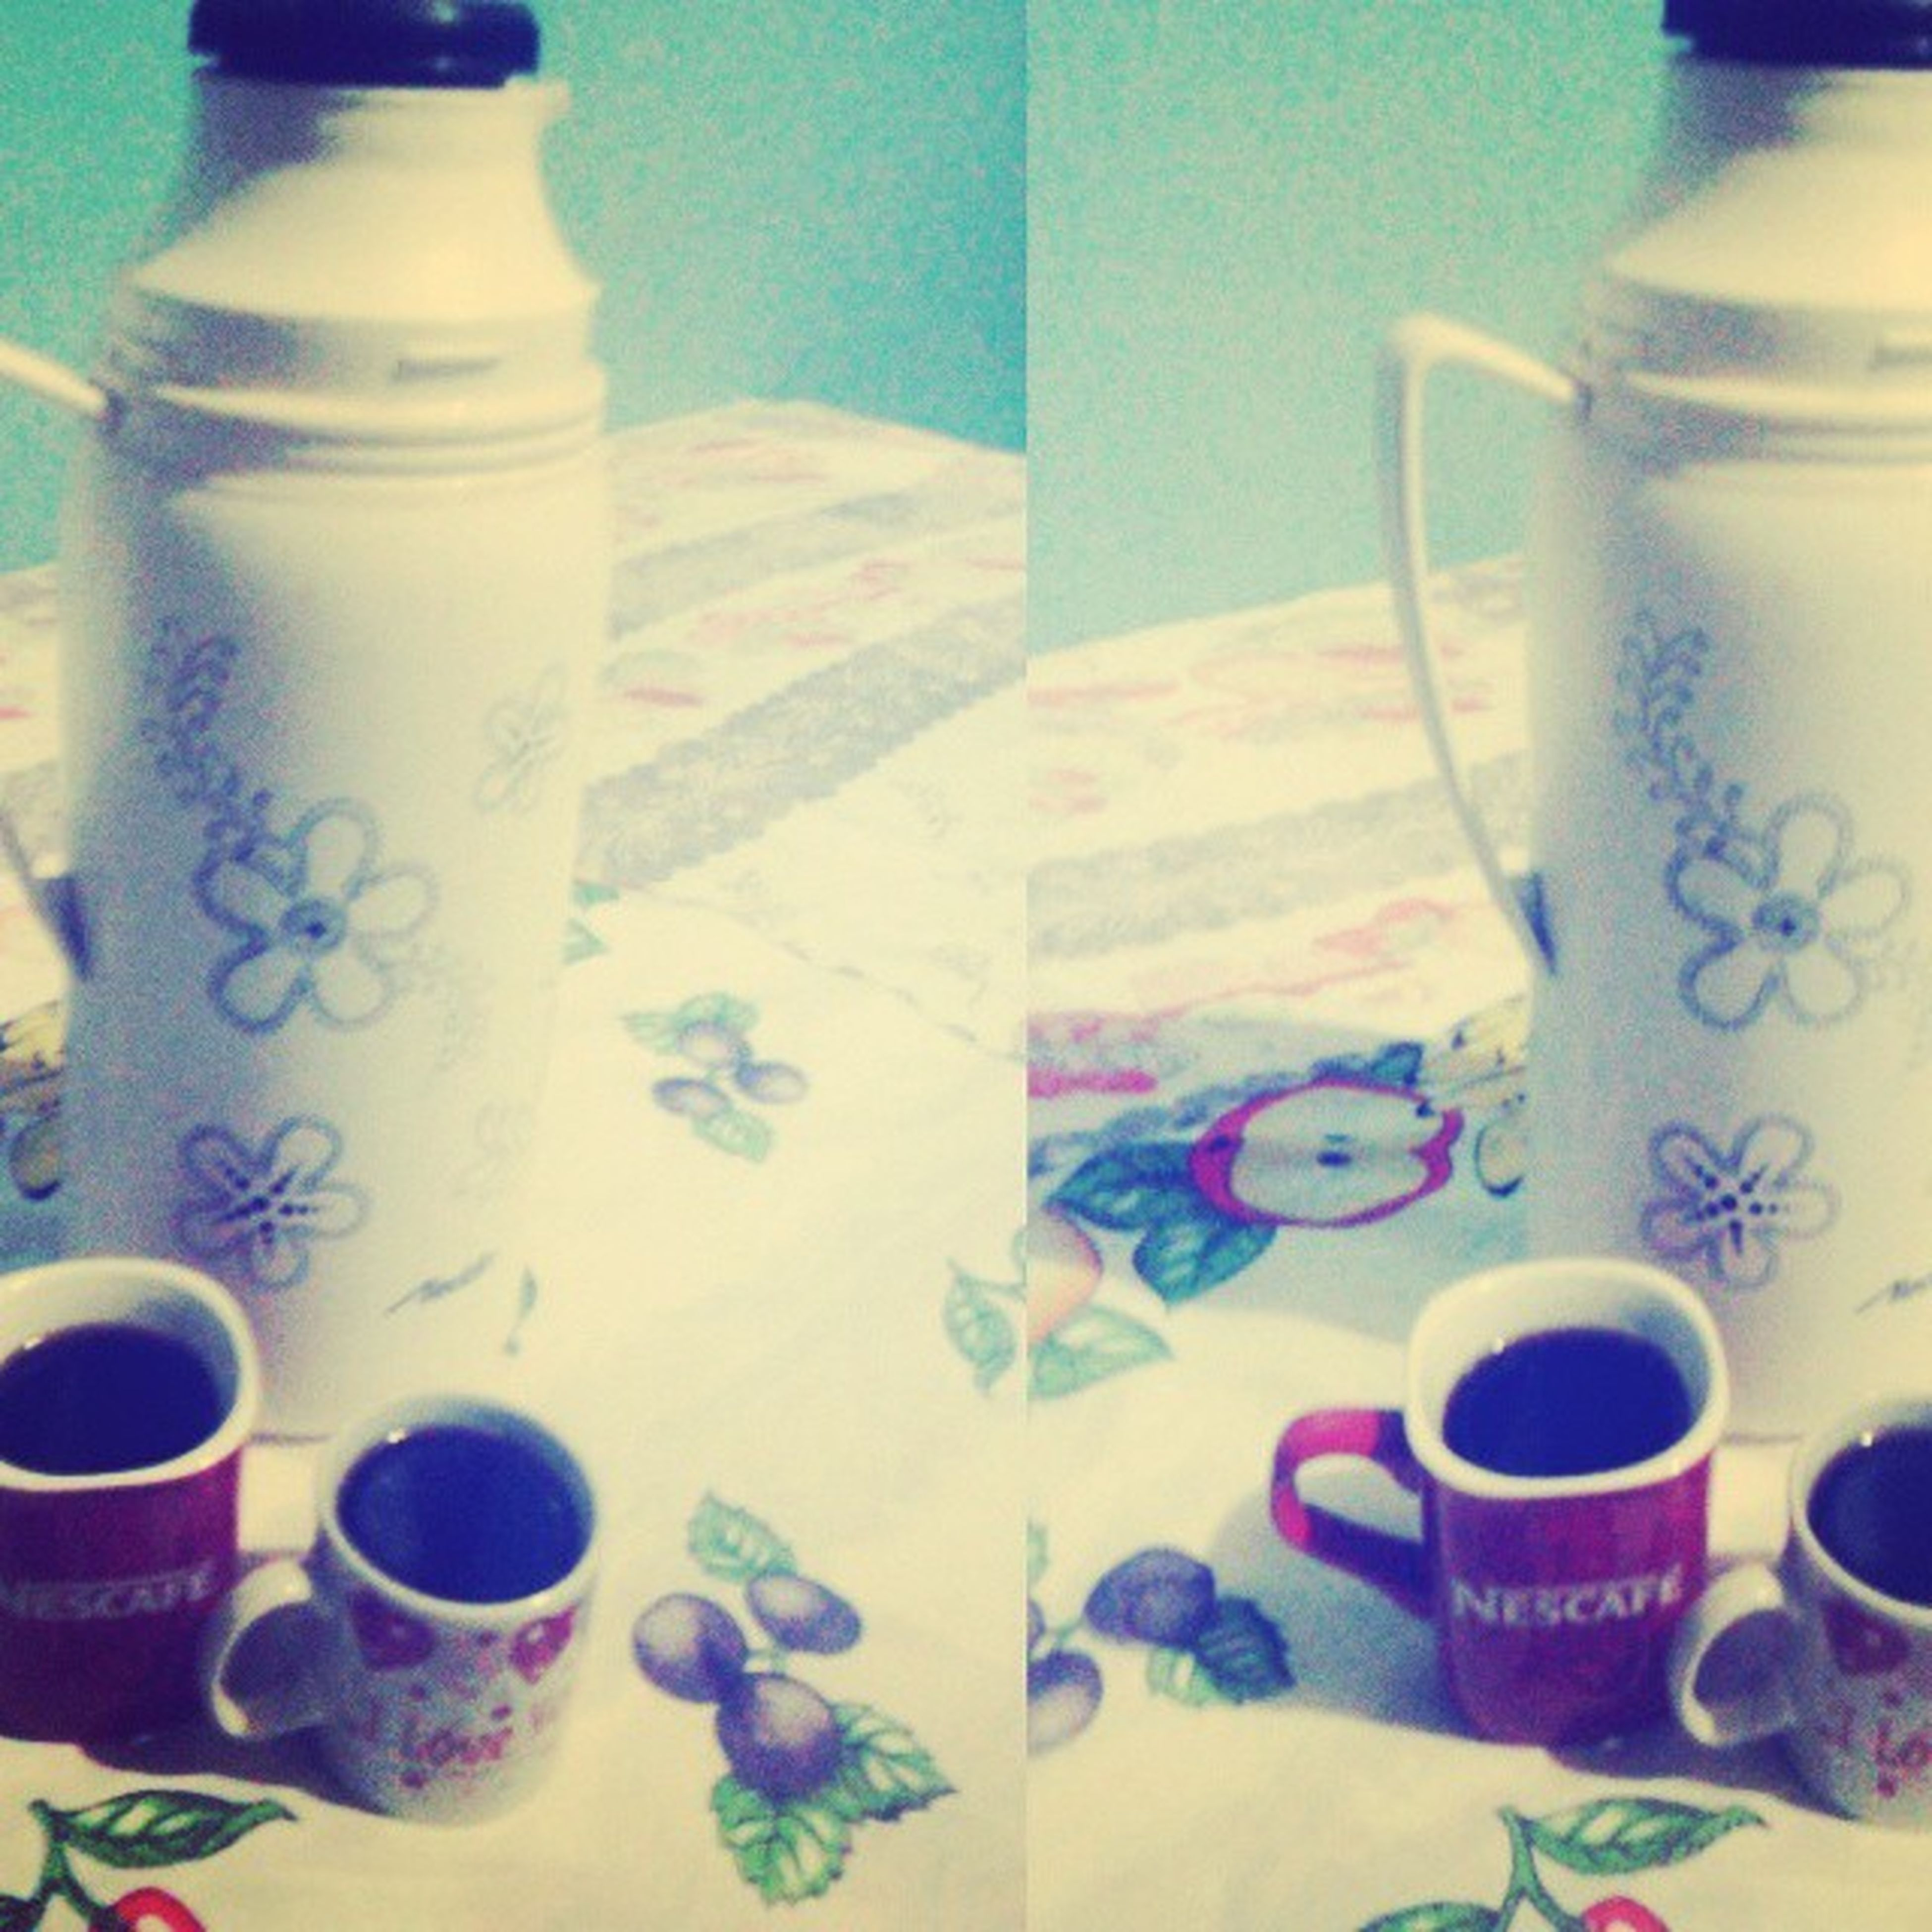 HojeaNoitefoidoCoffe hehehe Amô Coffe Cafépreto Forte Poucaaçucar kkkk PrazerdeBebercafé